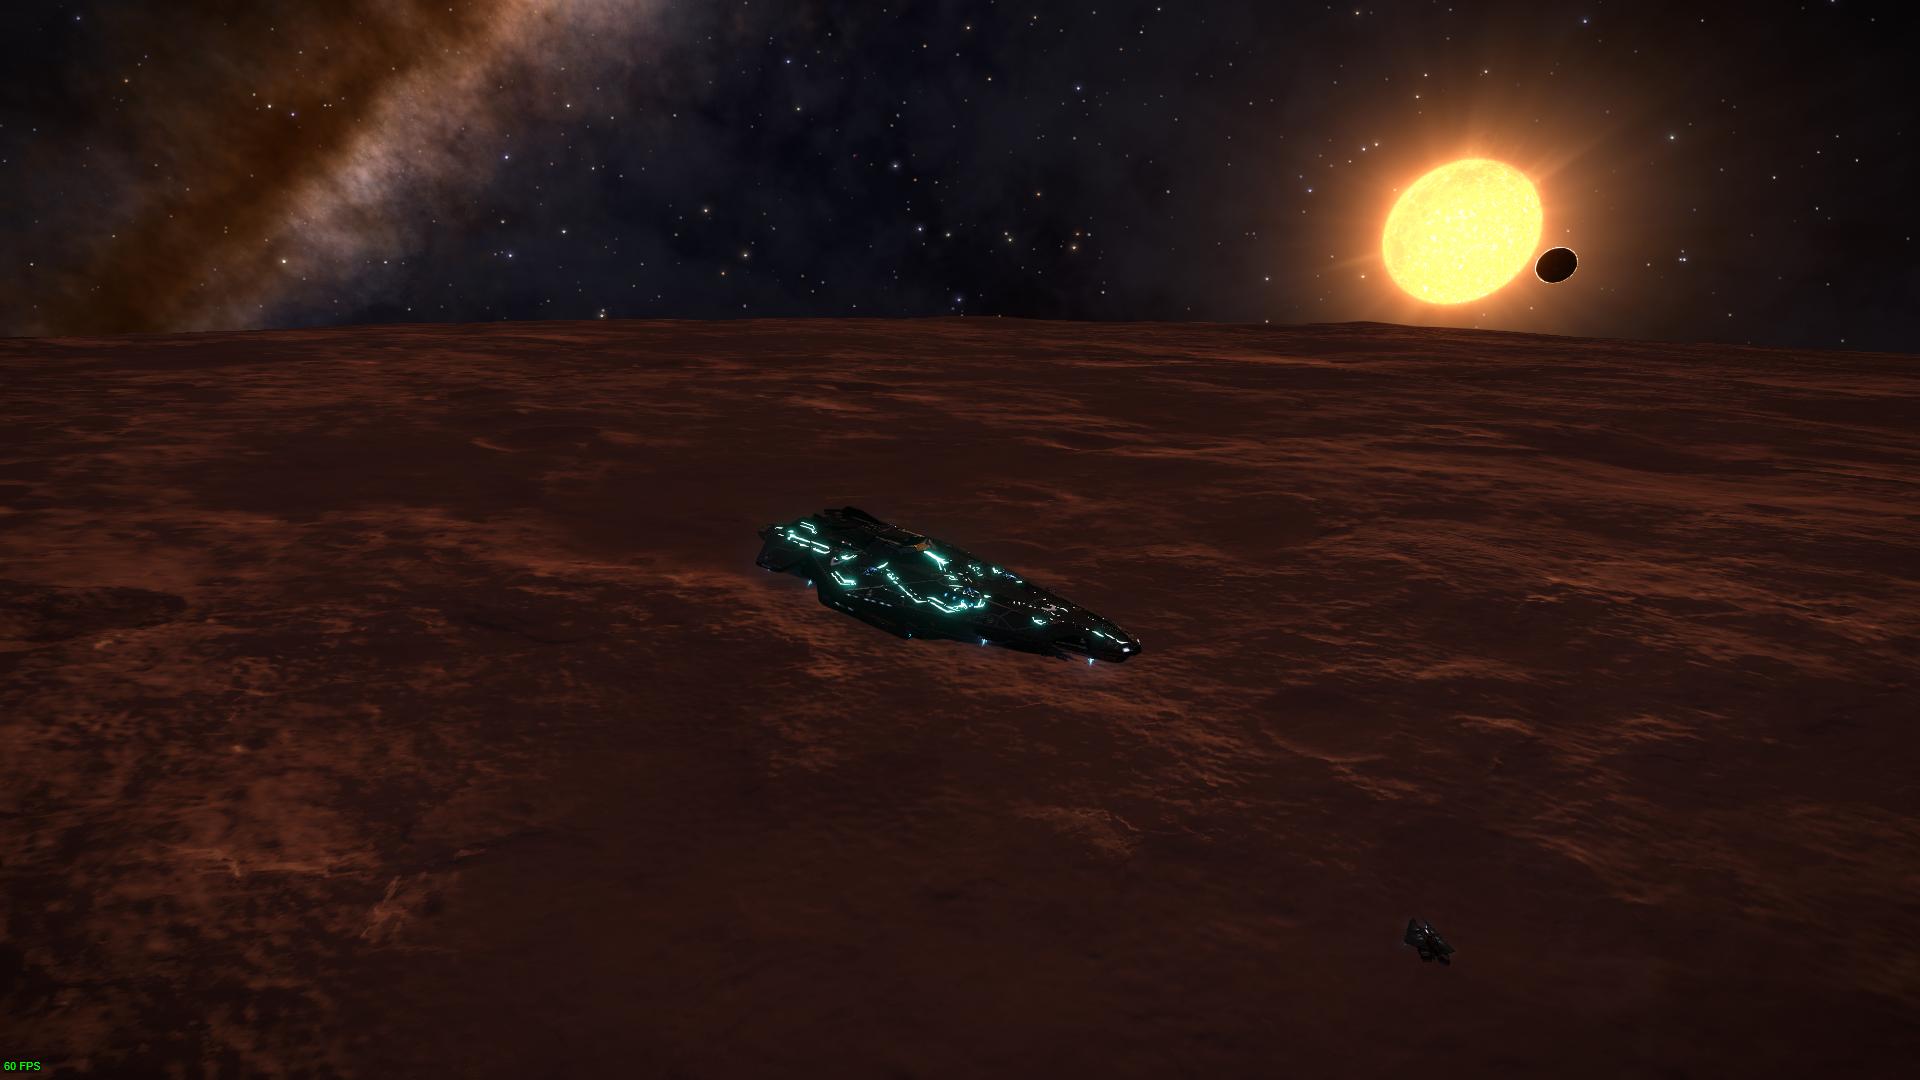 Wallpaper Elite Dangerous Anaconda Spaceship Stars Planet